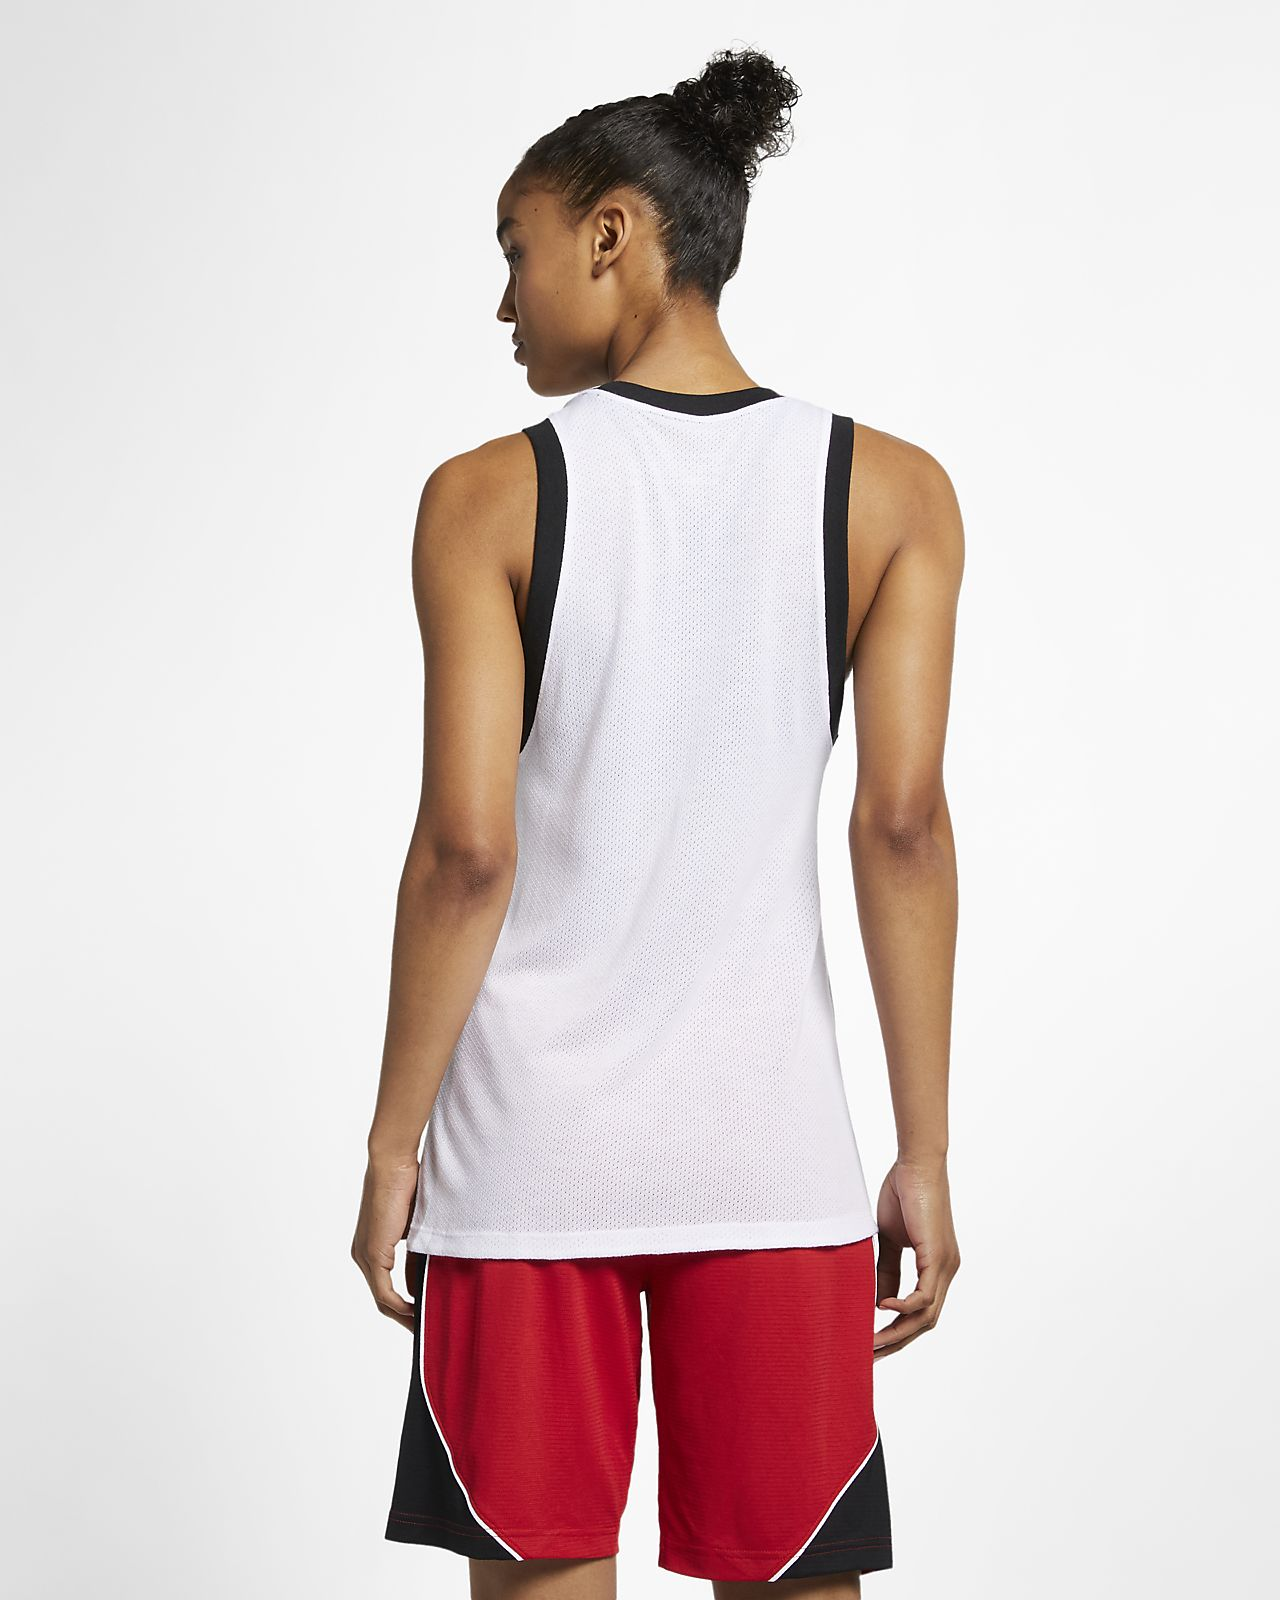 fadcd08dcc Nike Dri-FIT Elite női kosárlabdás trikó. Nike.com HU